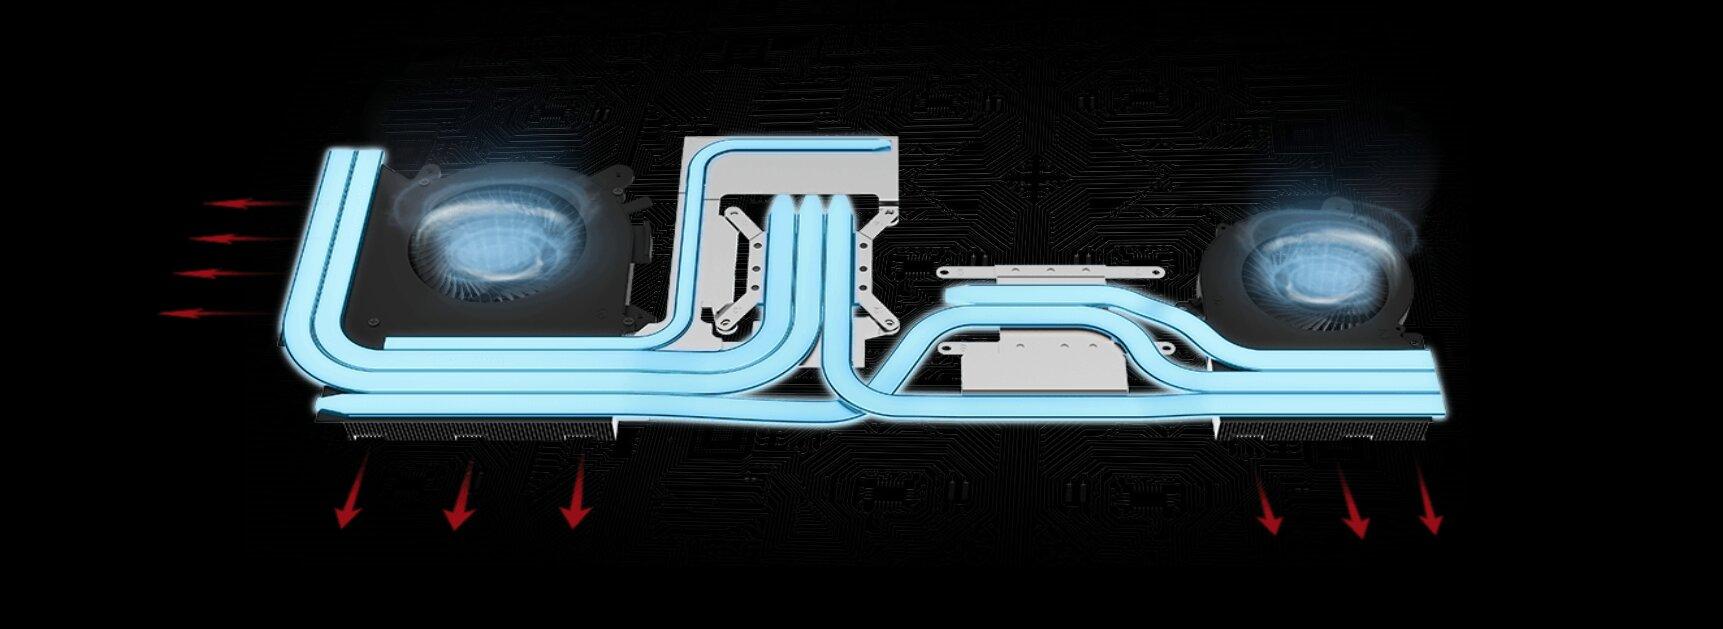 MSI Bravo 15 - حل التبريد (Cooler Boost 5)